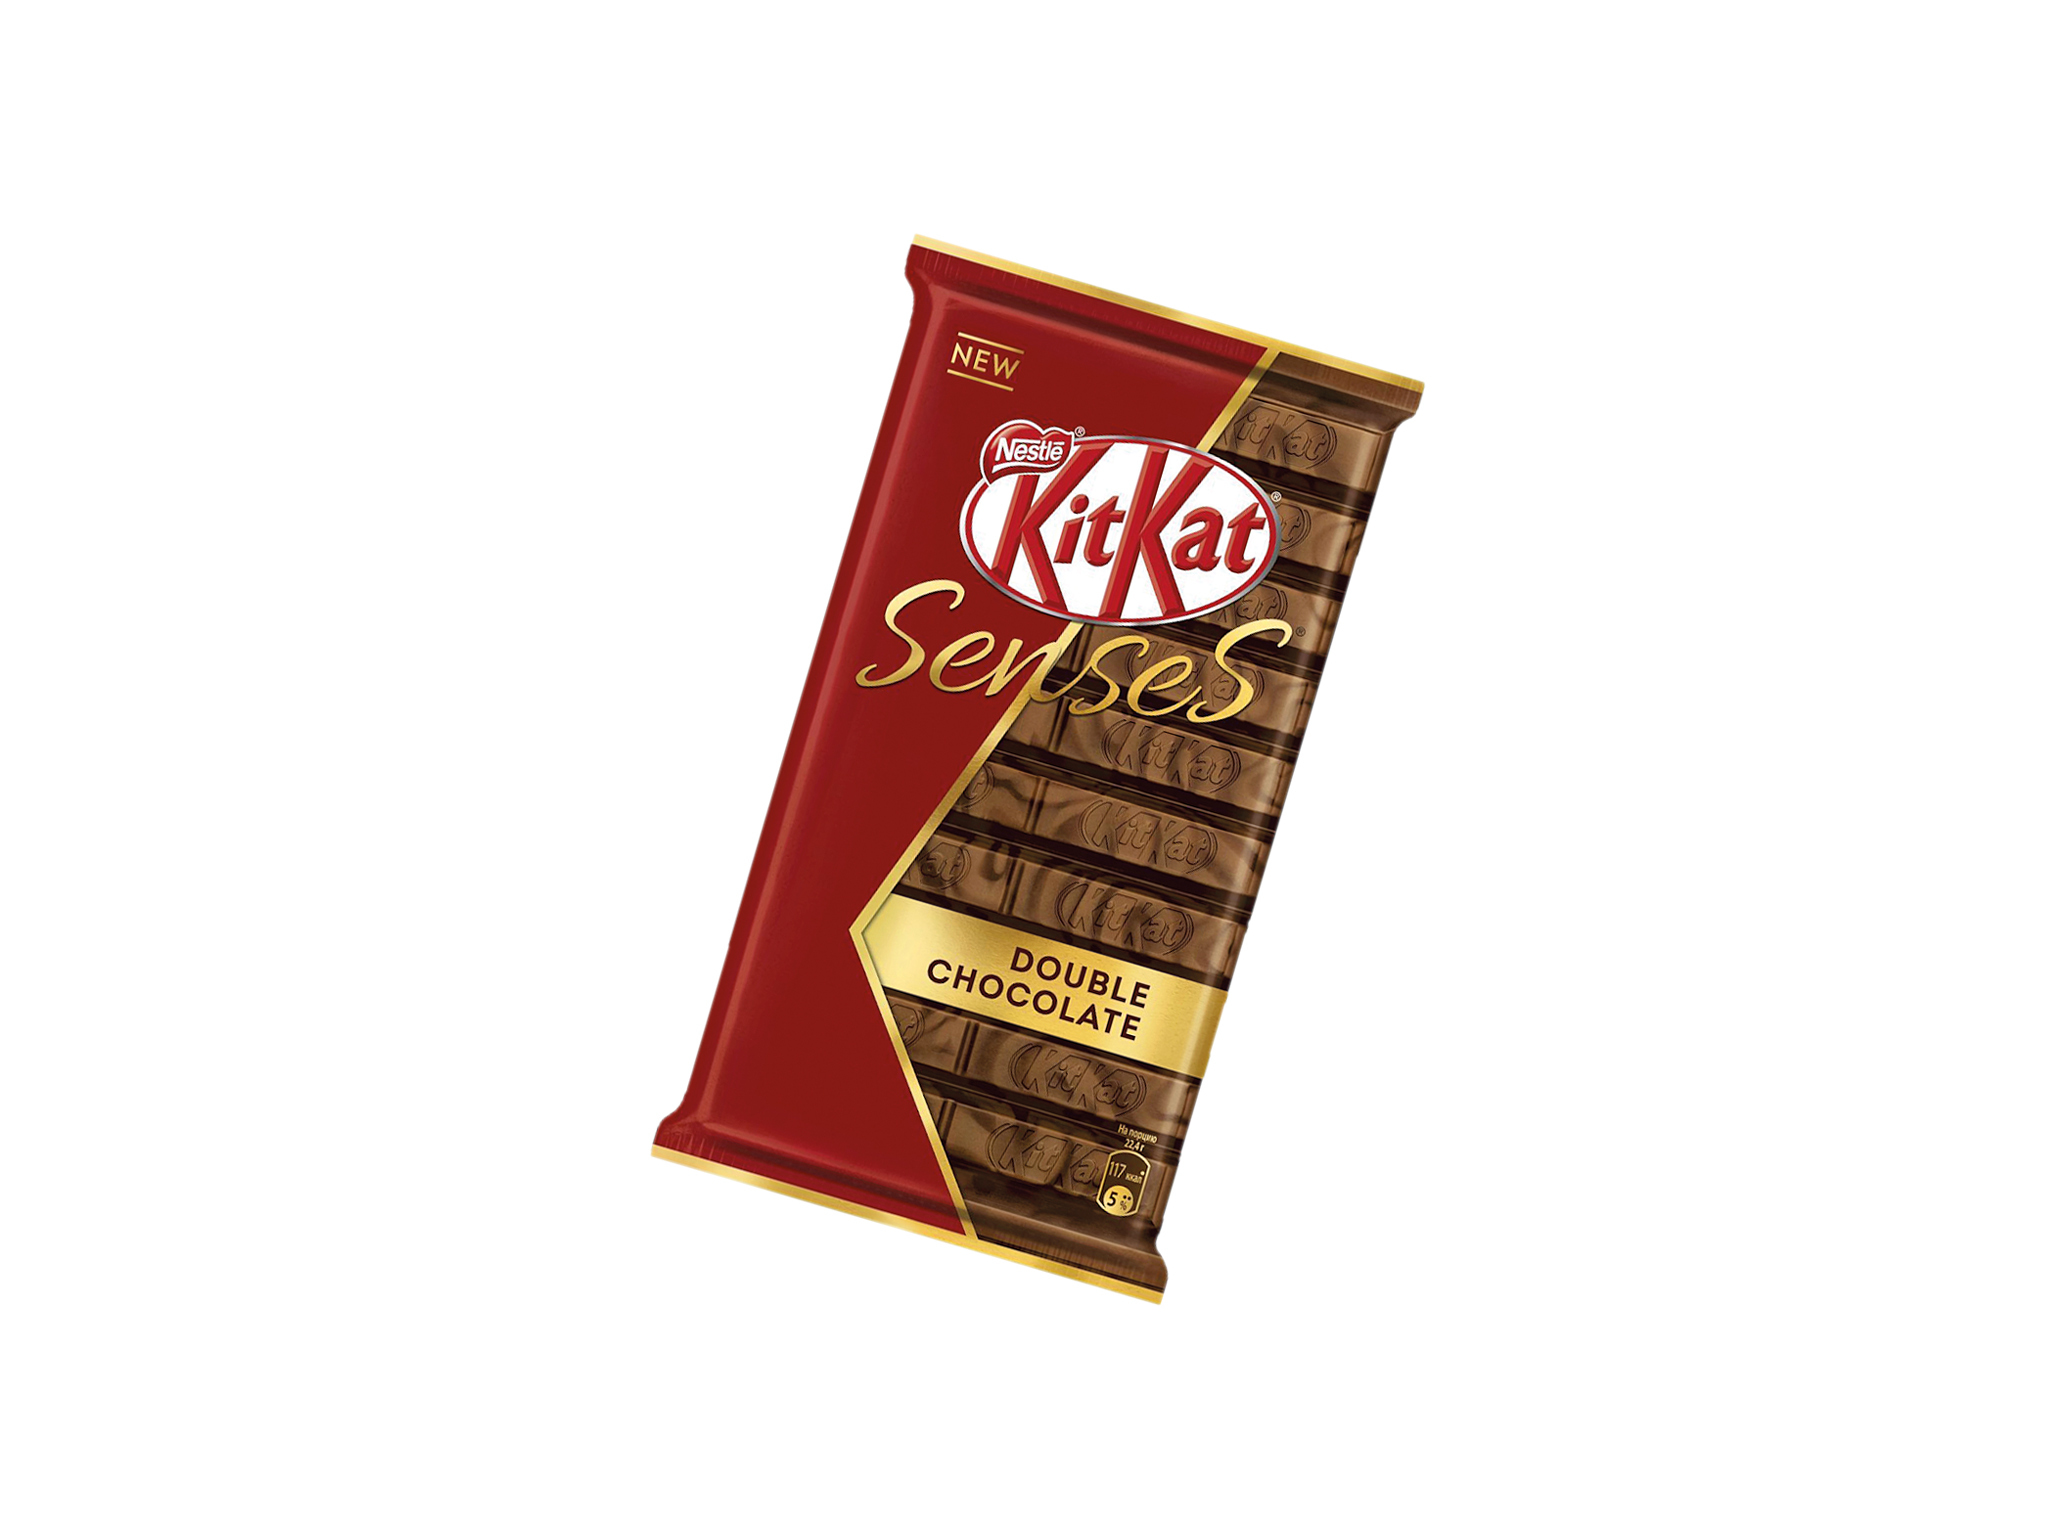 Kit Kat Senses Double Chocolate